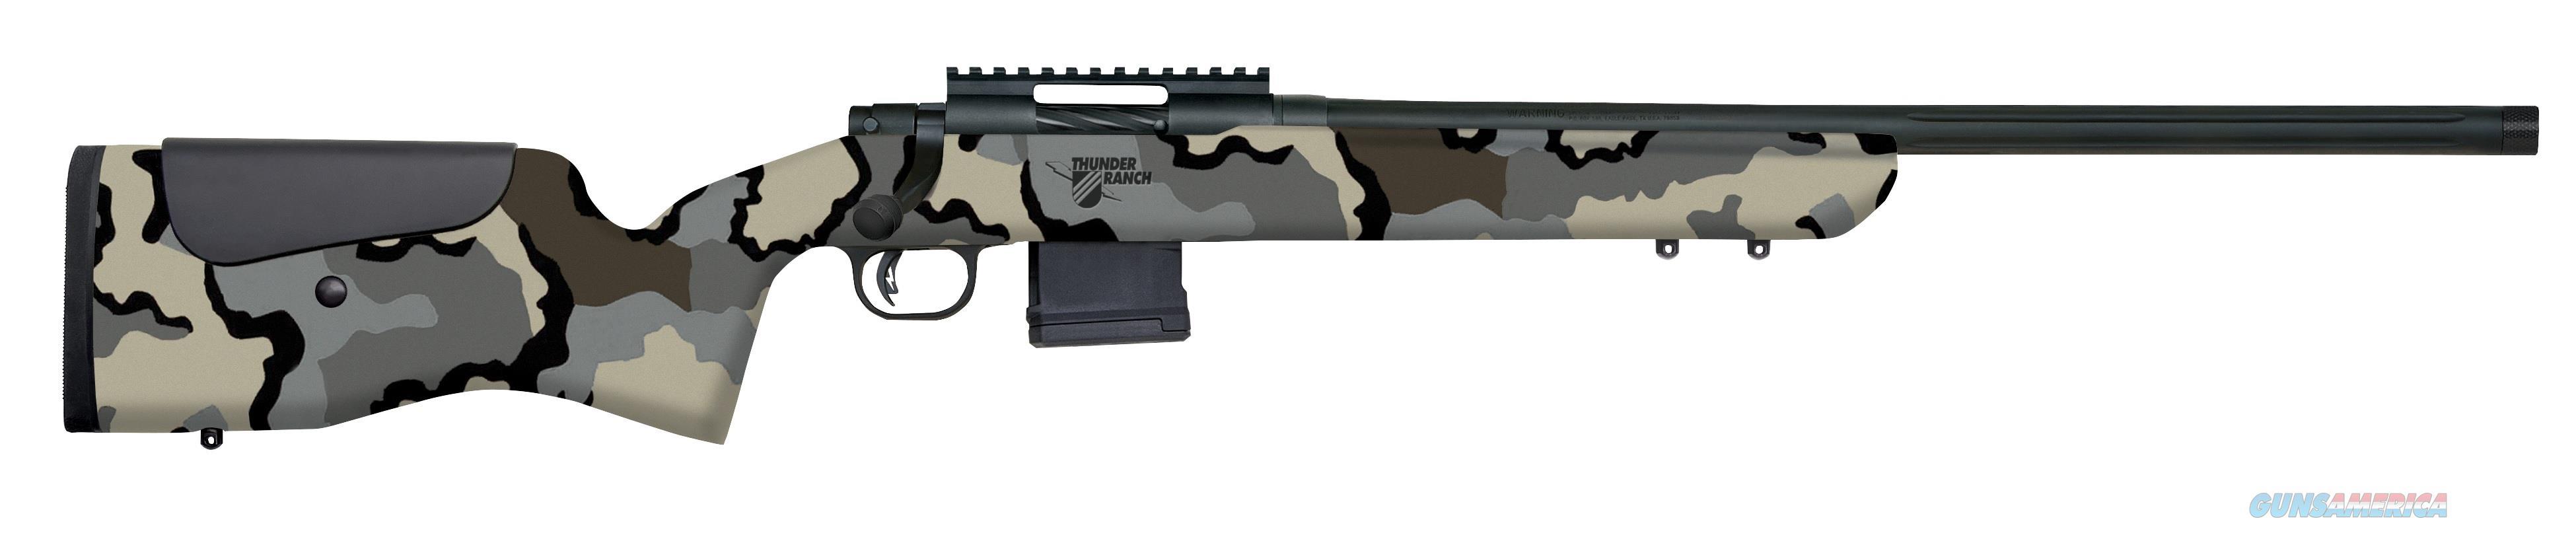 "Mossberg MVP LR Thunder Ranch 5.56 NATO 20"" Kuiu Camo 28040   Guns > Rifles > Mossberg Rifles > MVP"